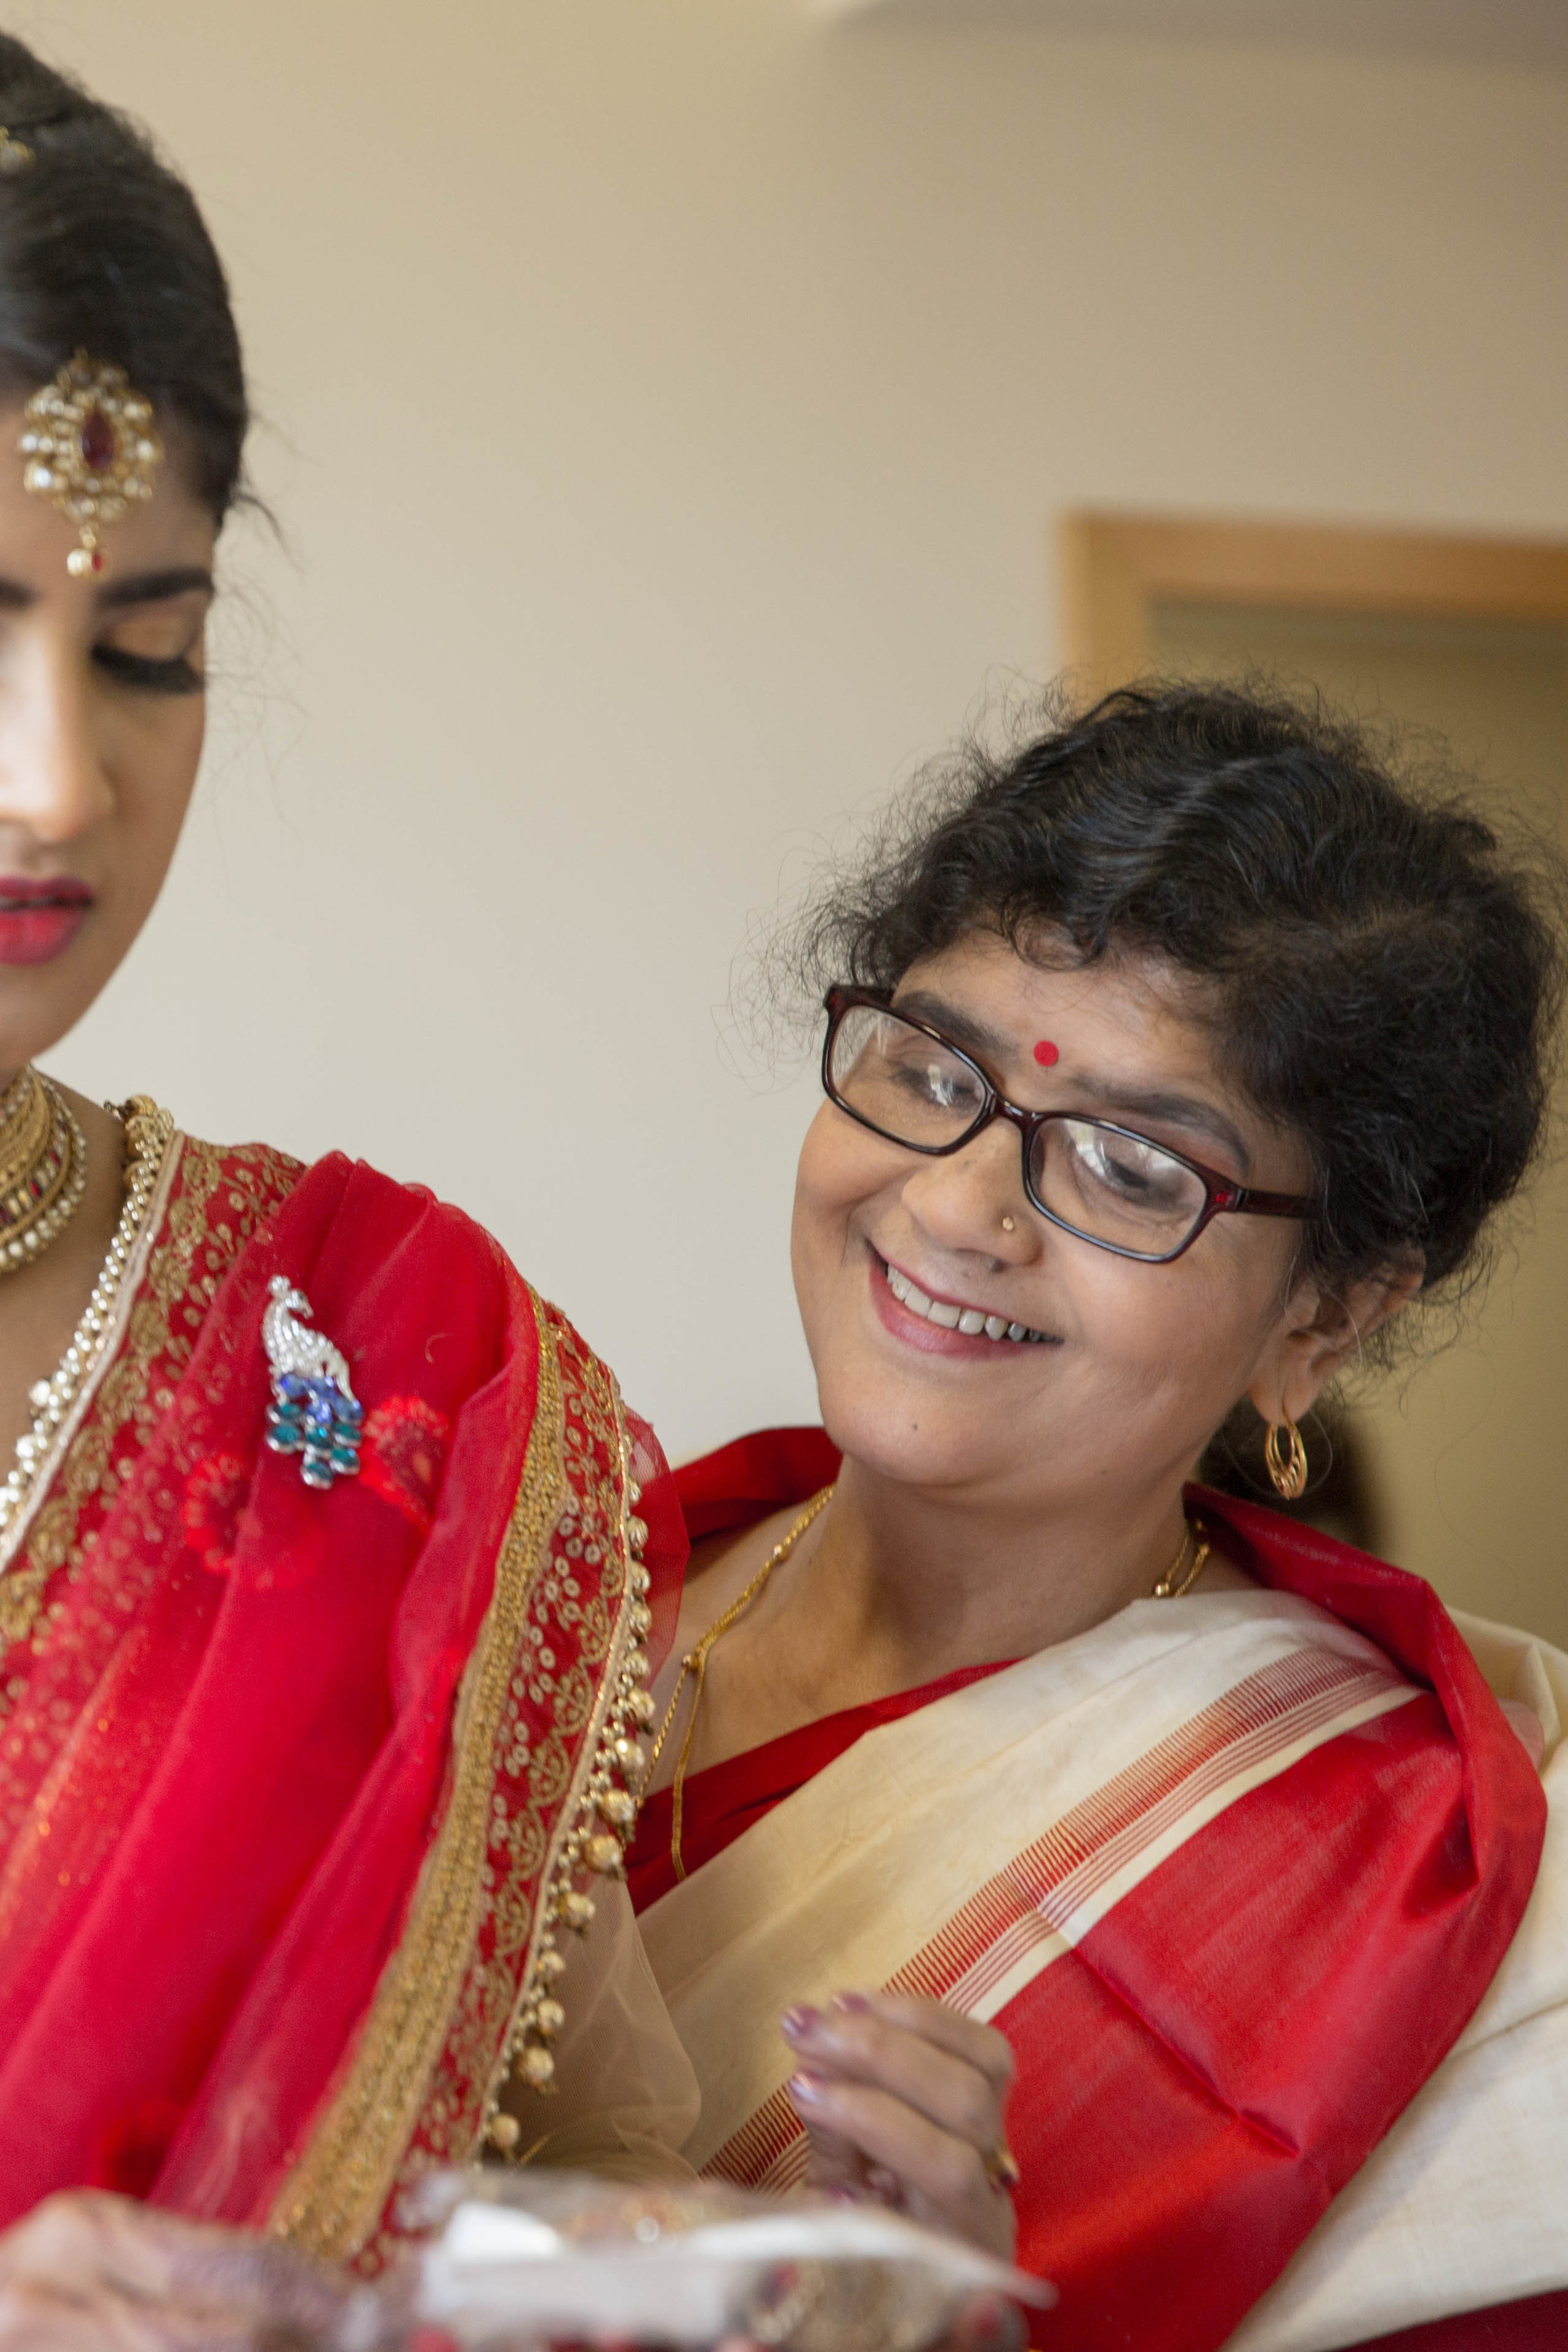 ramada-park-hall-hotel-birmingham-wolverhampton-hindu-wedding-asian-wedding-photography-natalia-smith-photography-12.jpg